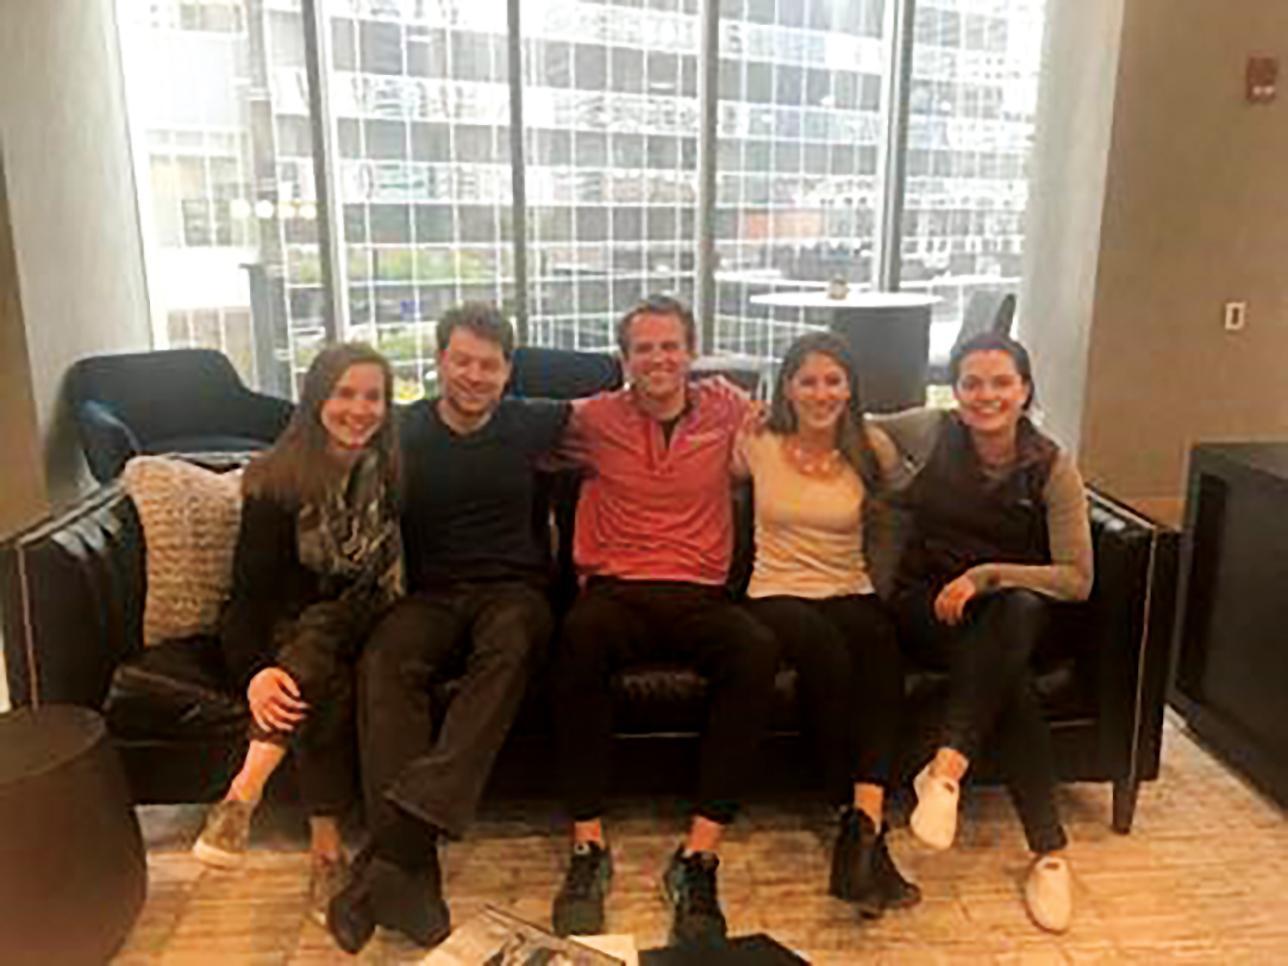 Five current SPS alumni at Chicago Booth School of Business (l. to r.): Gwen Schoch '10, Andrew Lopez-Balboa '10, Ben Ruffel '09, Caroline Arenz '08, and Sarah Clark-Hamel '07.